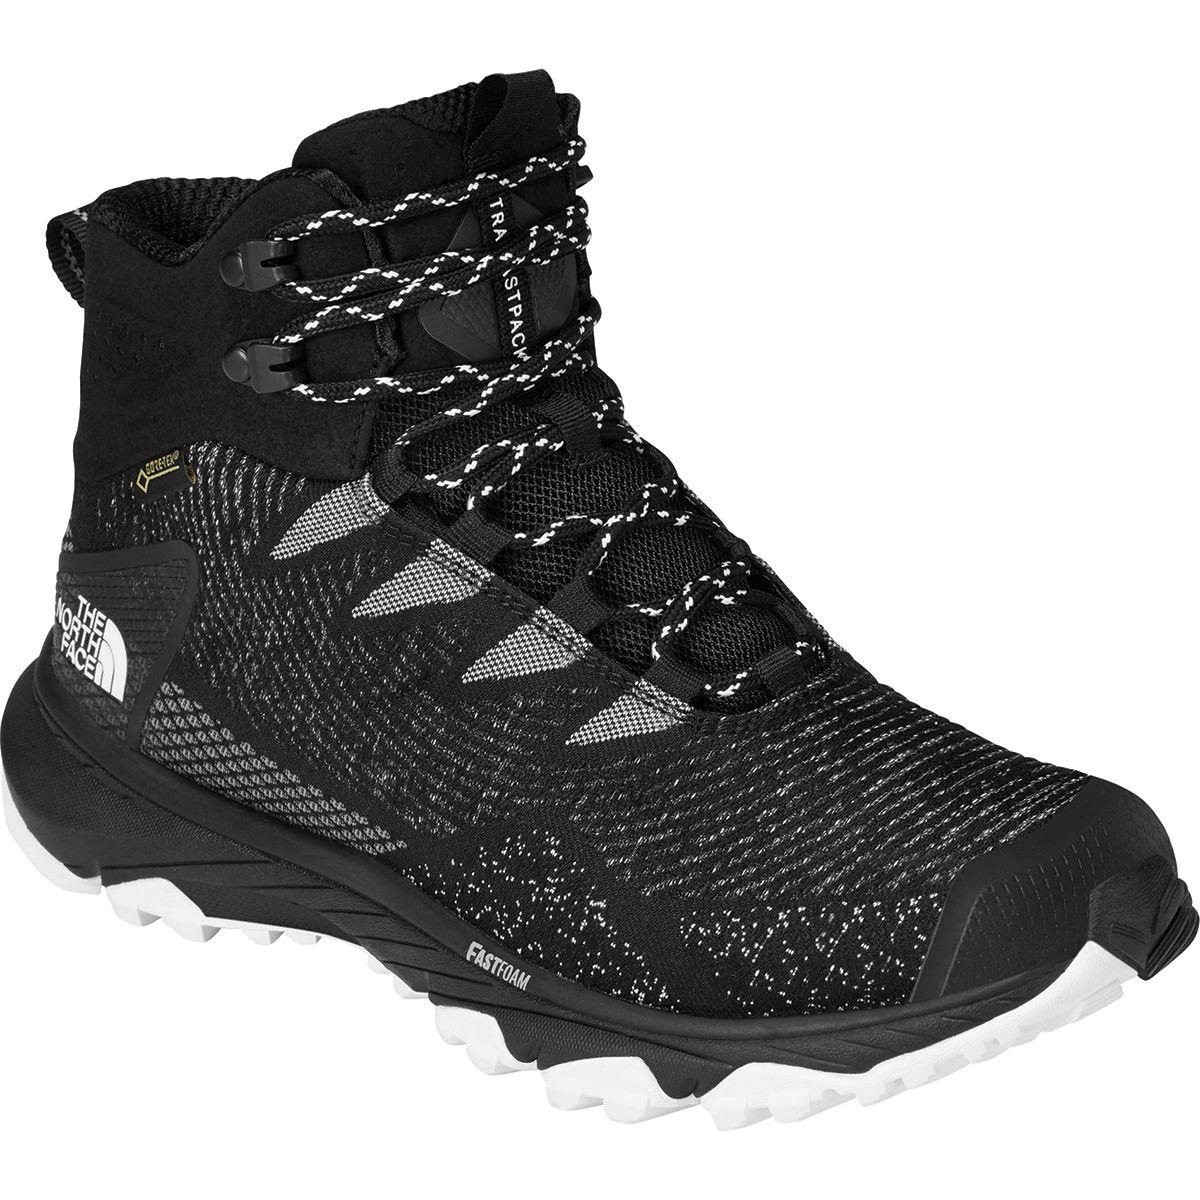 The North Face Ultra Fastpack III Mid GTX Woven Hiking Boot - Women's Tnf Black/Tnf White, 6.5 TNF04EI-TNFBLAWH-S65